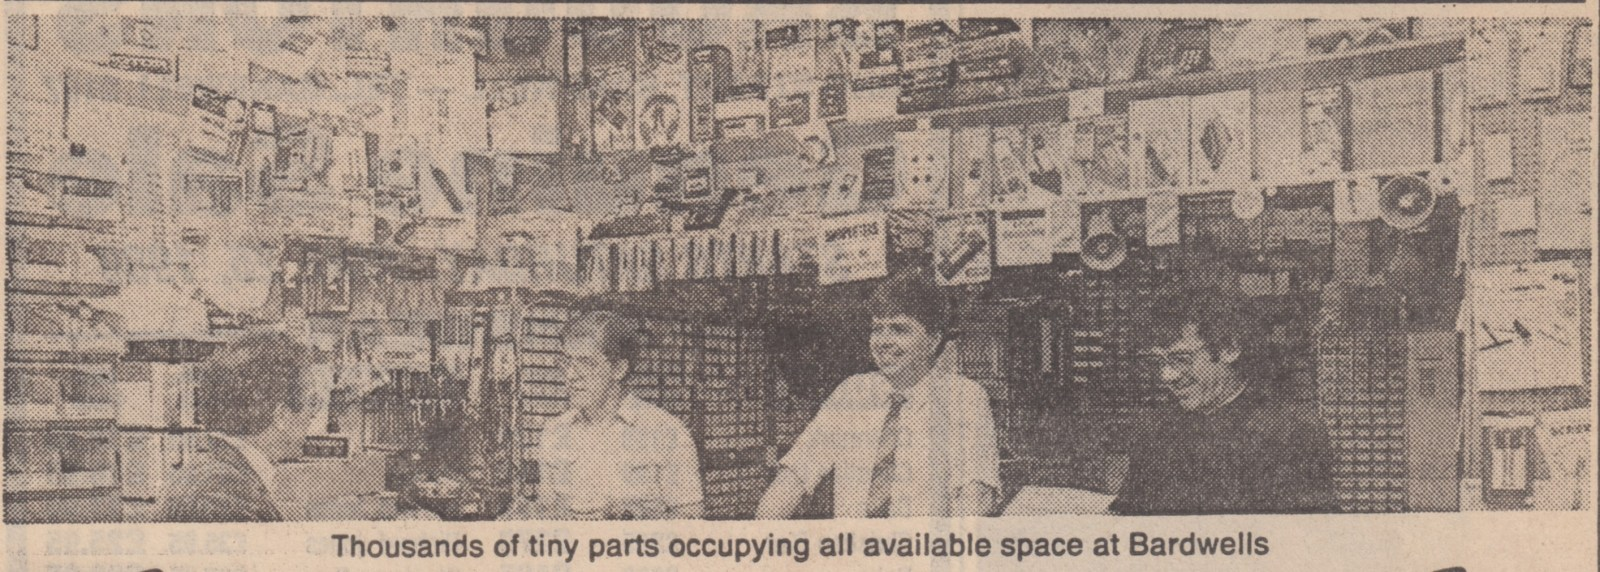 Bardwells 1988.jpg